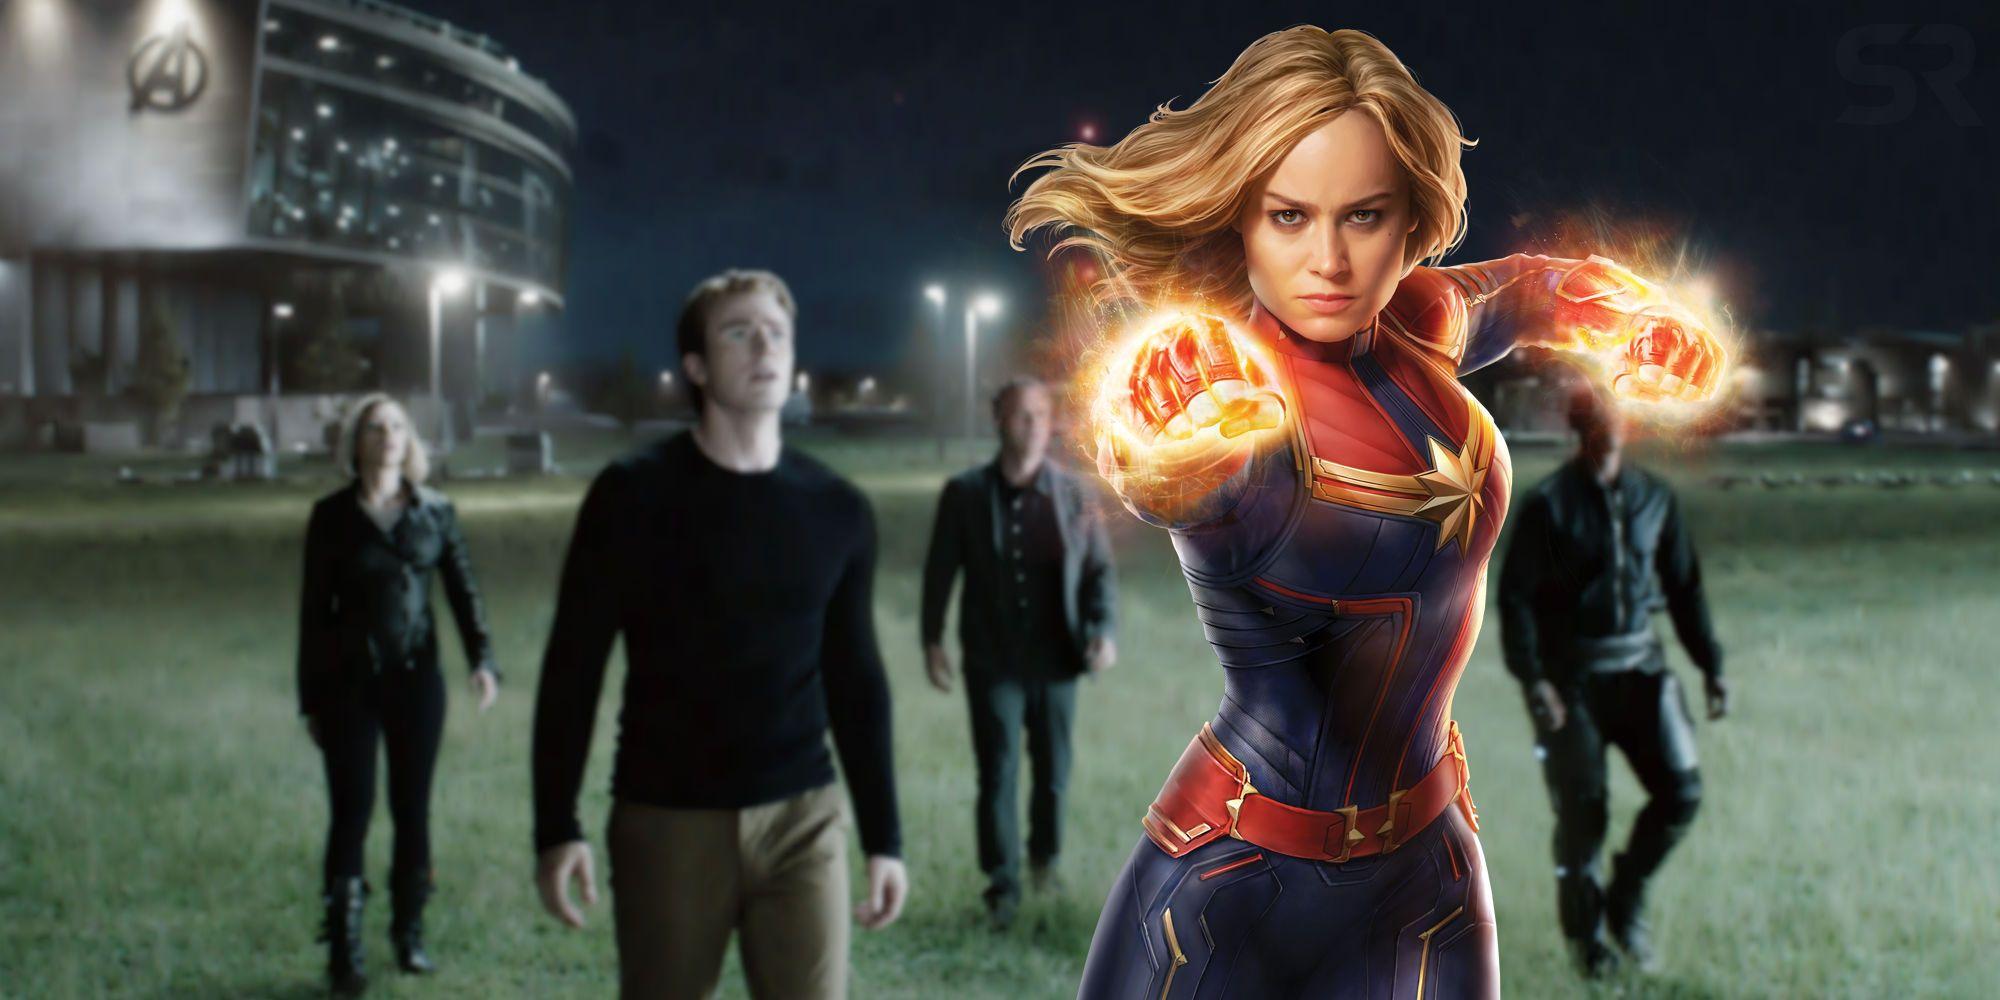 captain marvel's post-credit scenes make no sense after